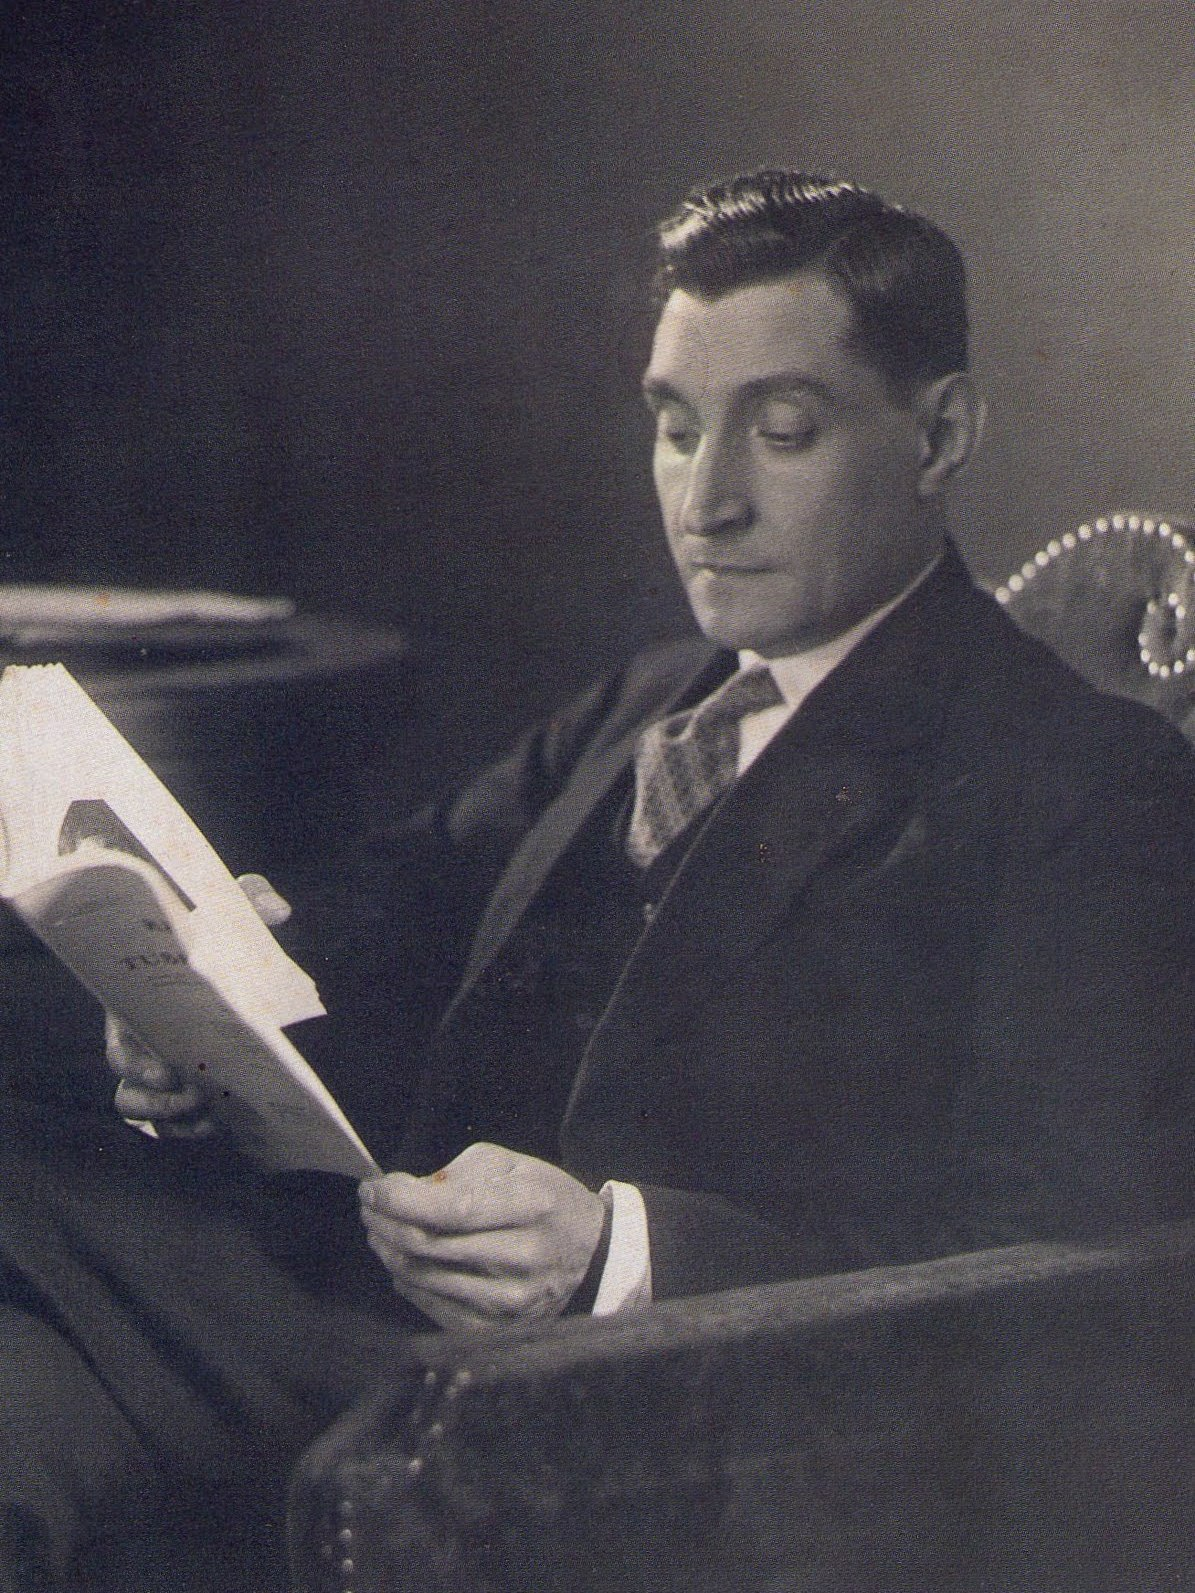 António de Oliveira Salazar in 1940